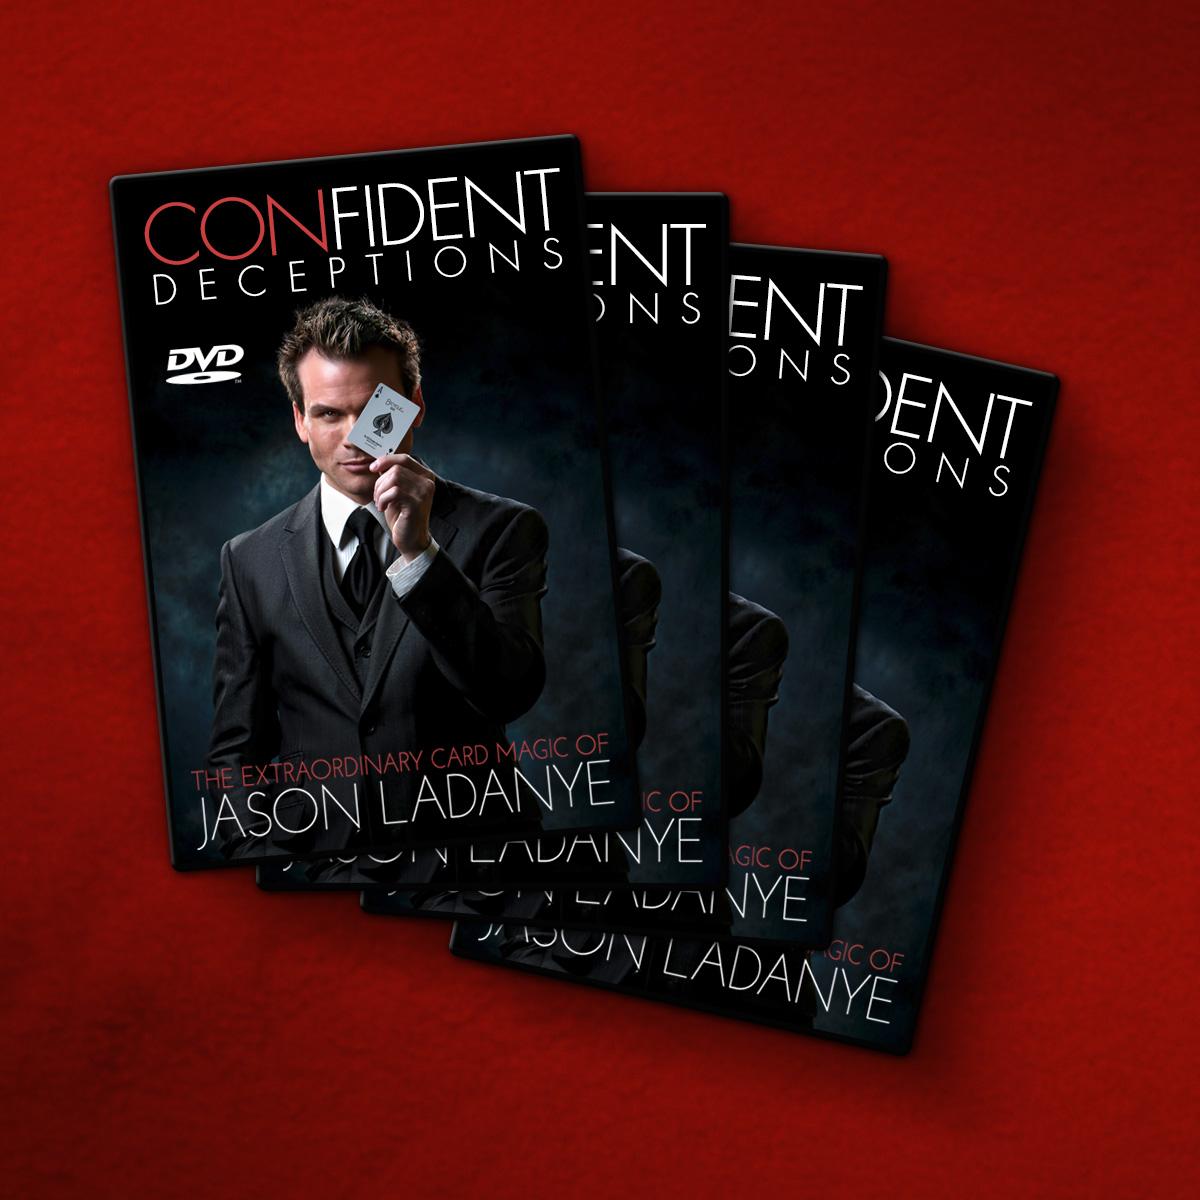 Confident Deceptions by Jason Ladanye